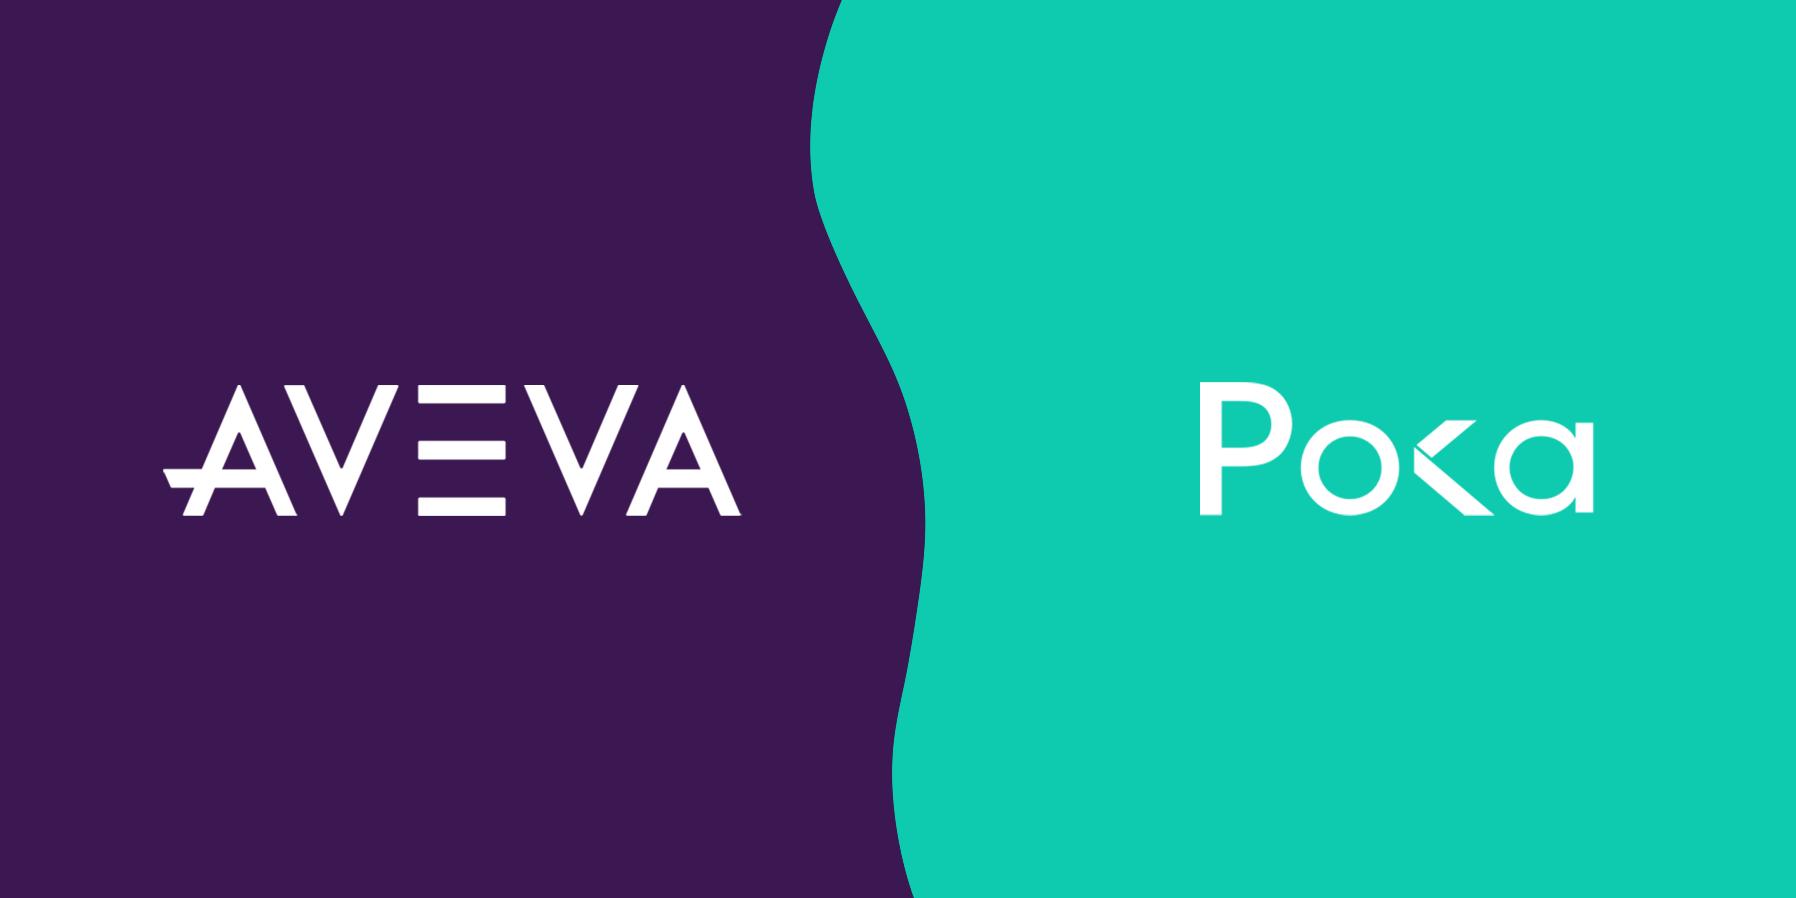 AVEVA and Poka Partner to Accelerate Industrial Workforce Digital Transformation